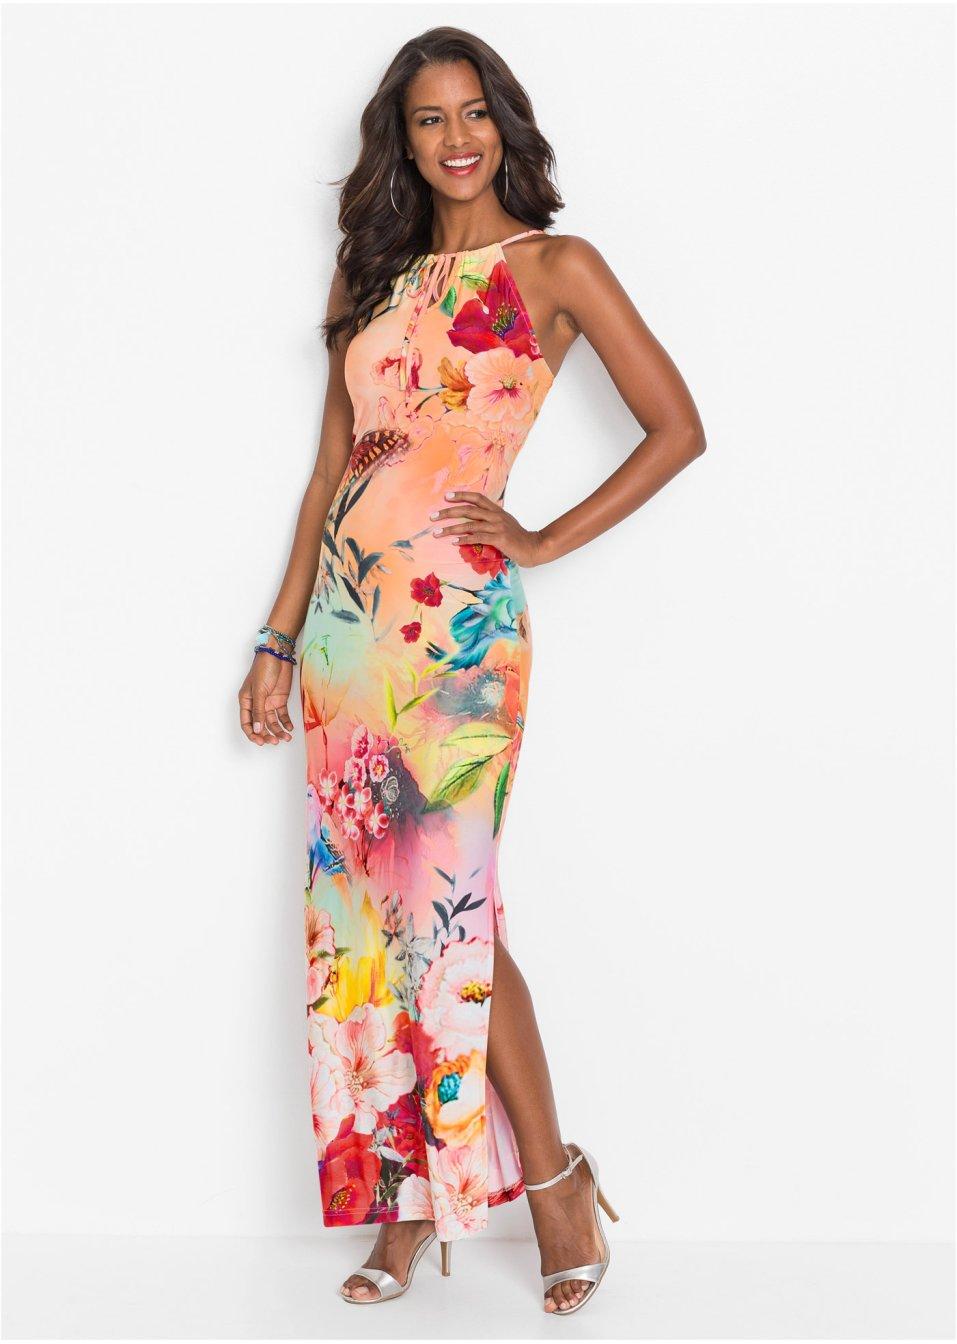 Floral bedrucktes Kleid in Maxilänge - rosa geblümt